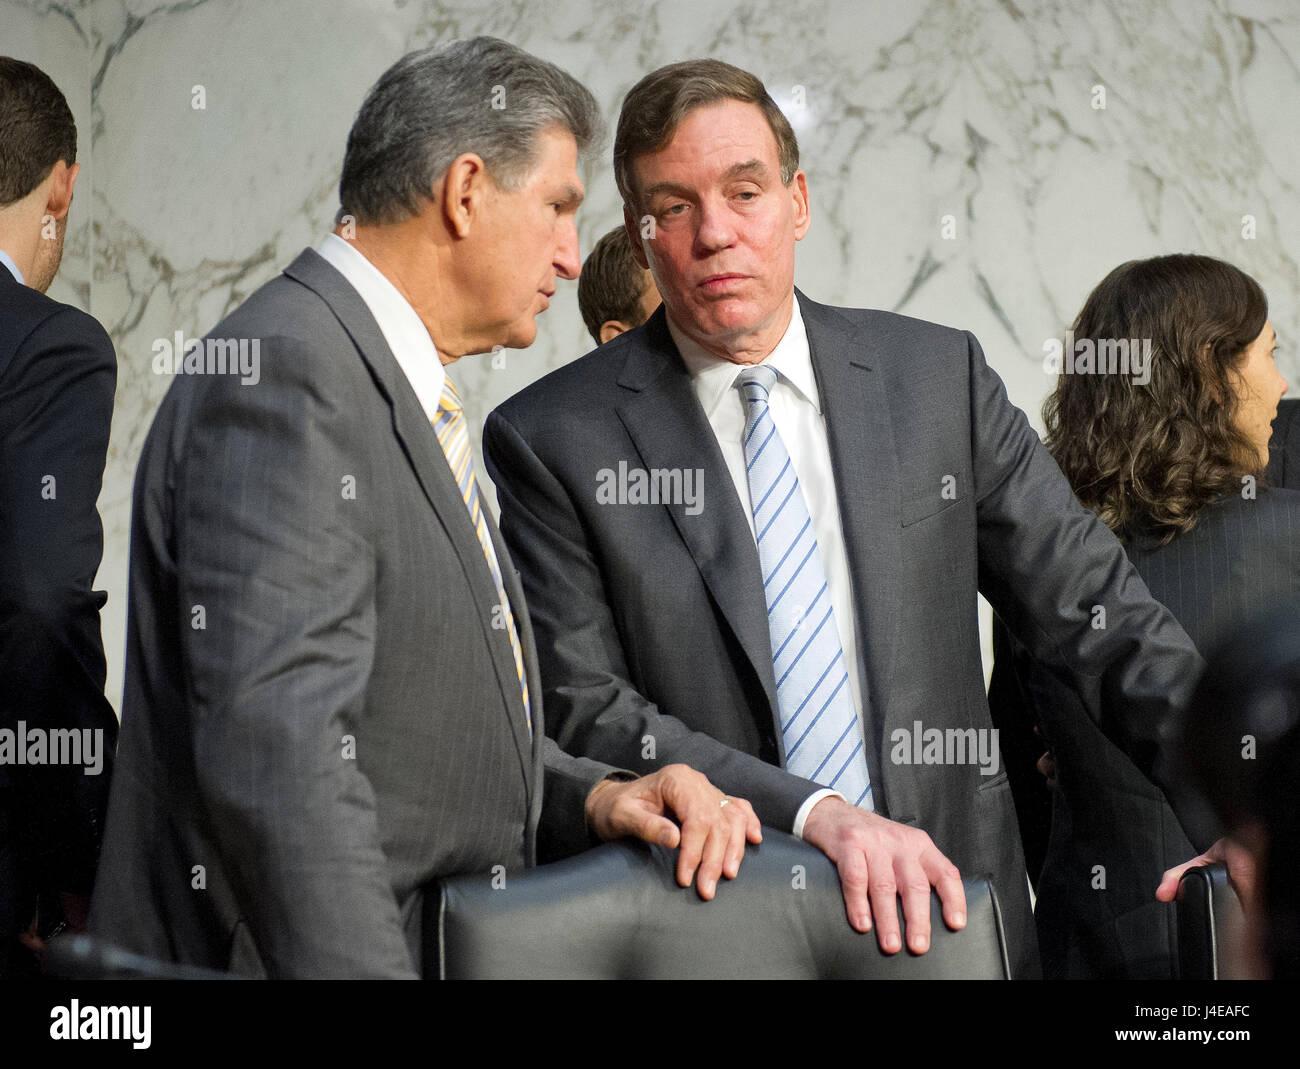 United States Senators Joe Minchin (Democrat of West